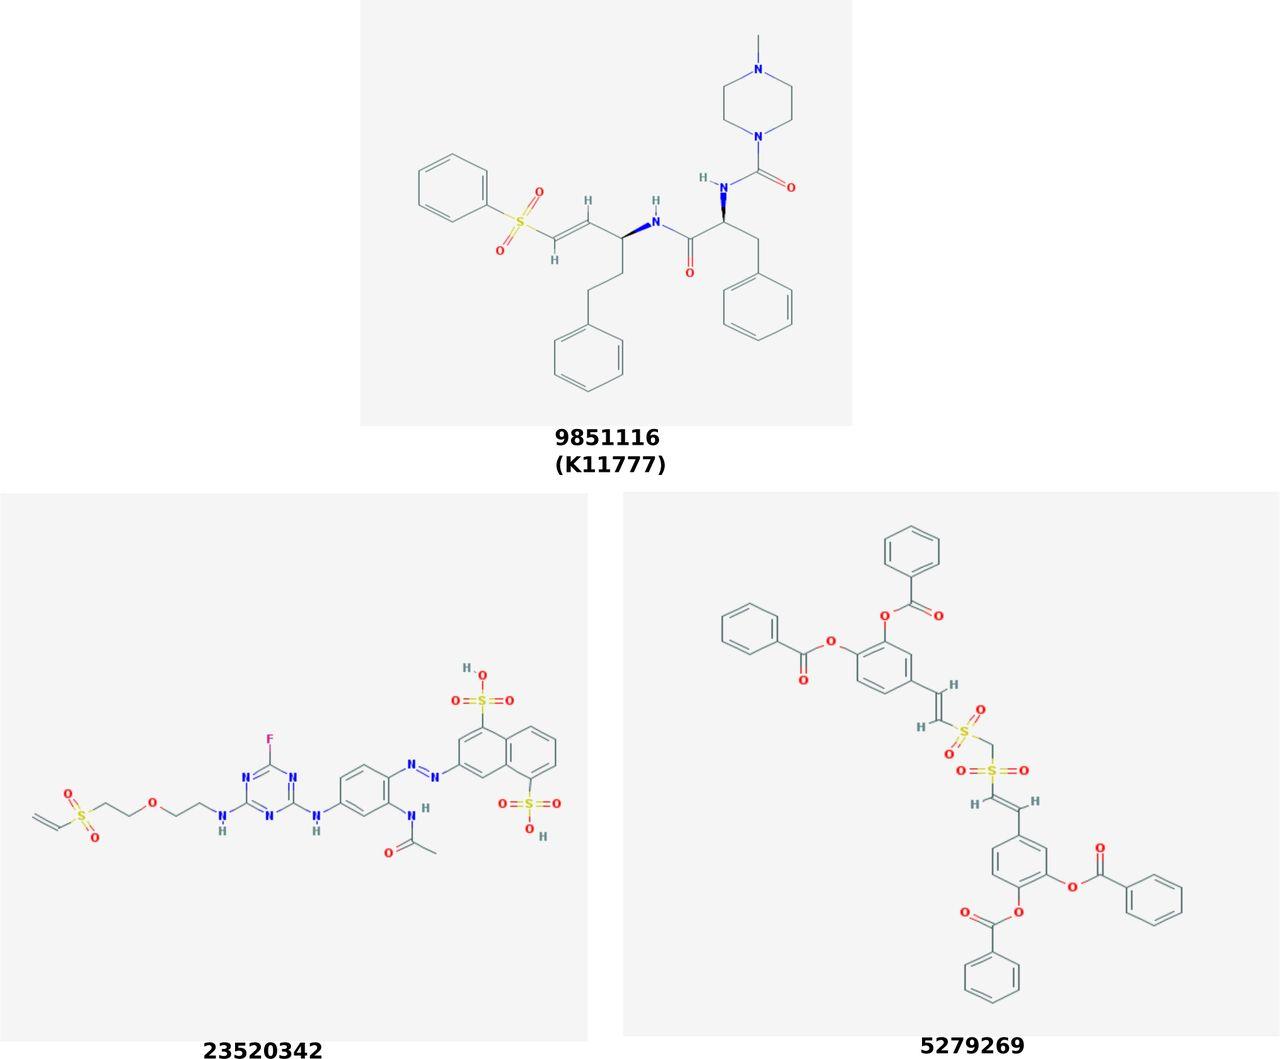 Identification and design of vinyl sulfone inhibitors